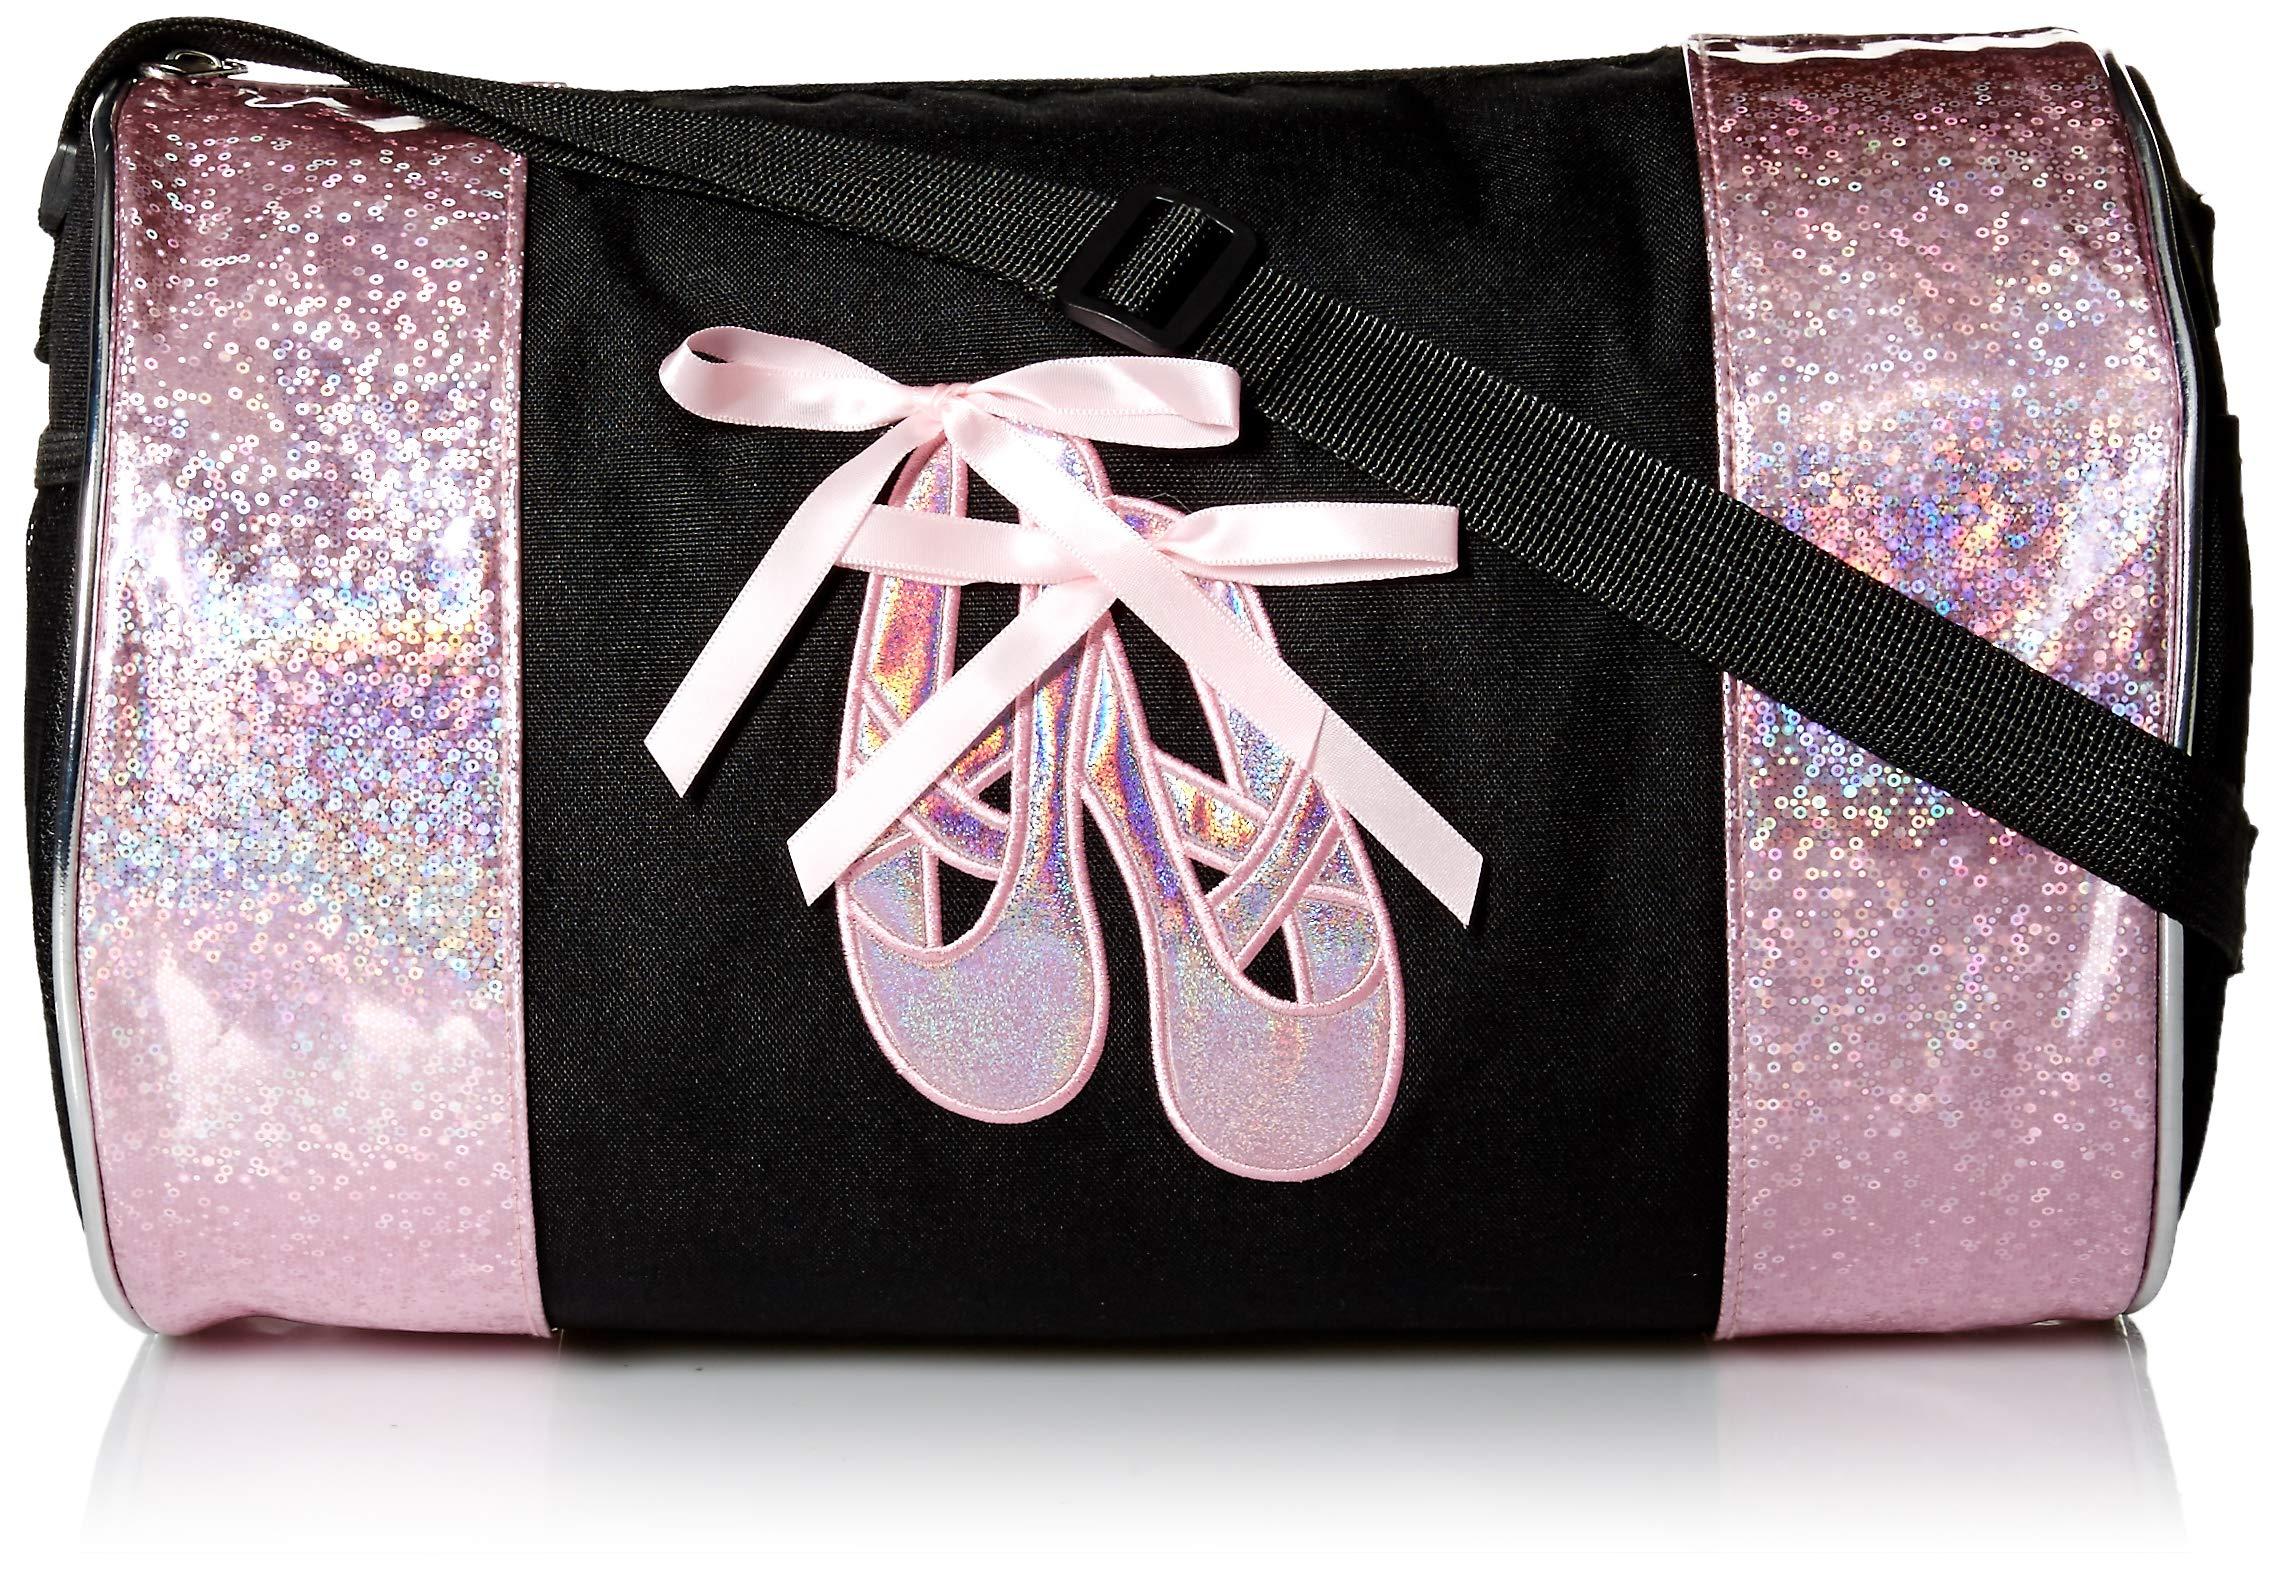 Dance Ballet Slippers Duffel Bag (Black/Pink) by Princess